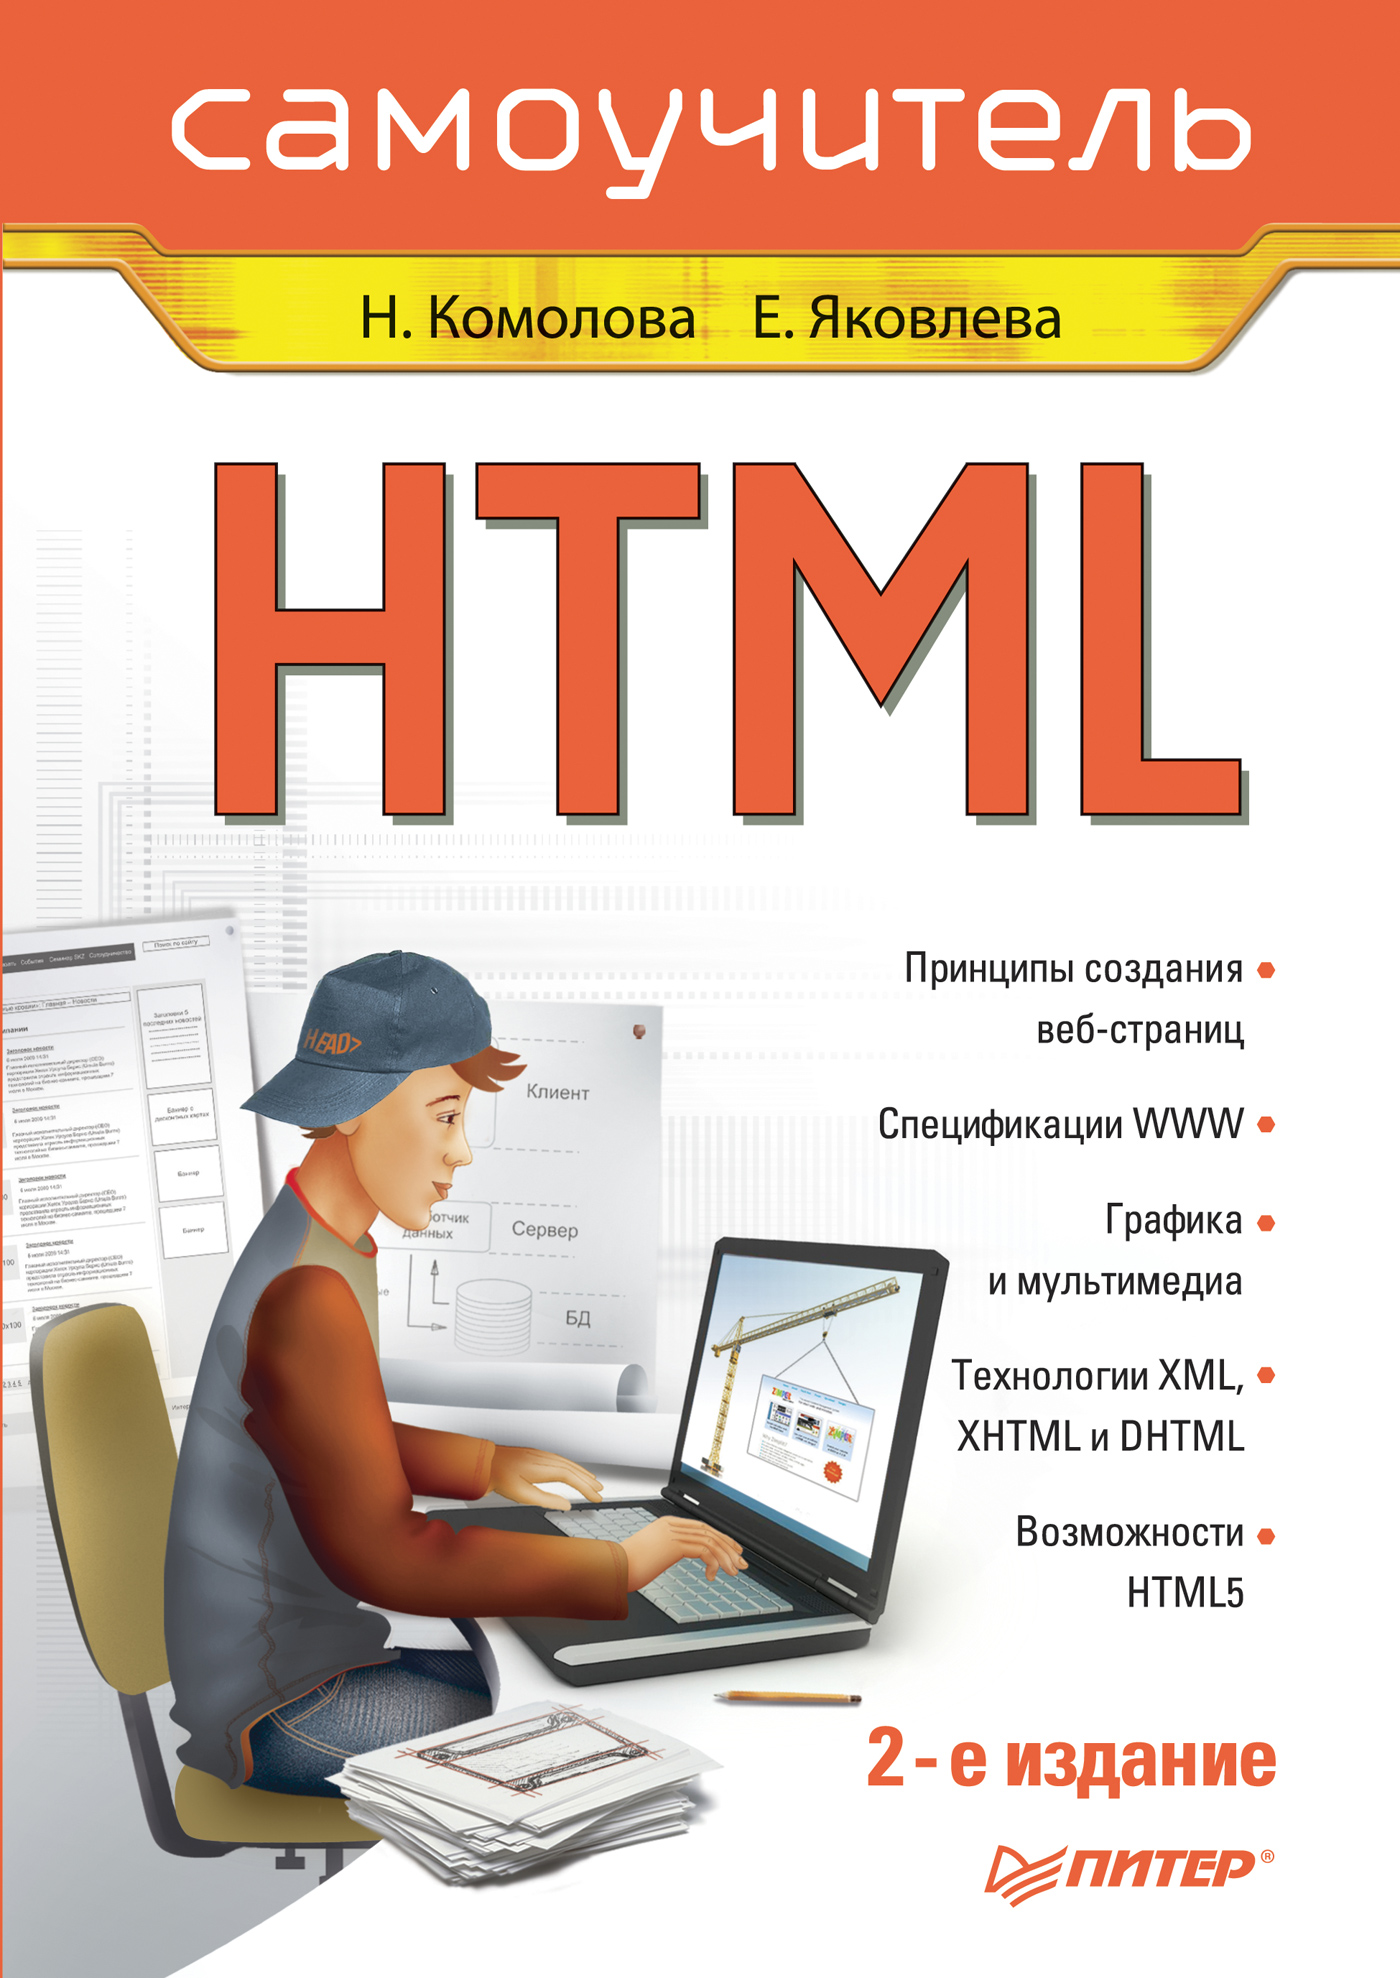 Нина Комолова, Елена Яковлева «HTML. Самоучитель»